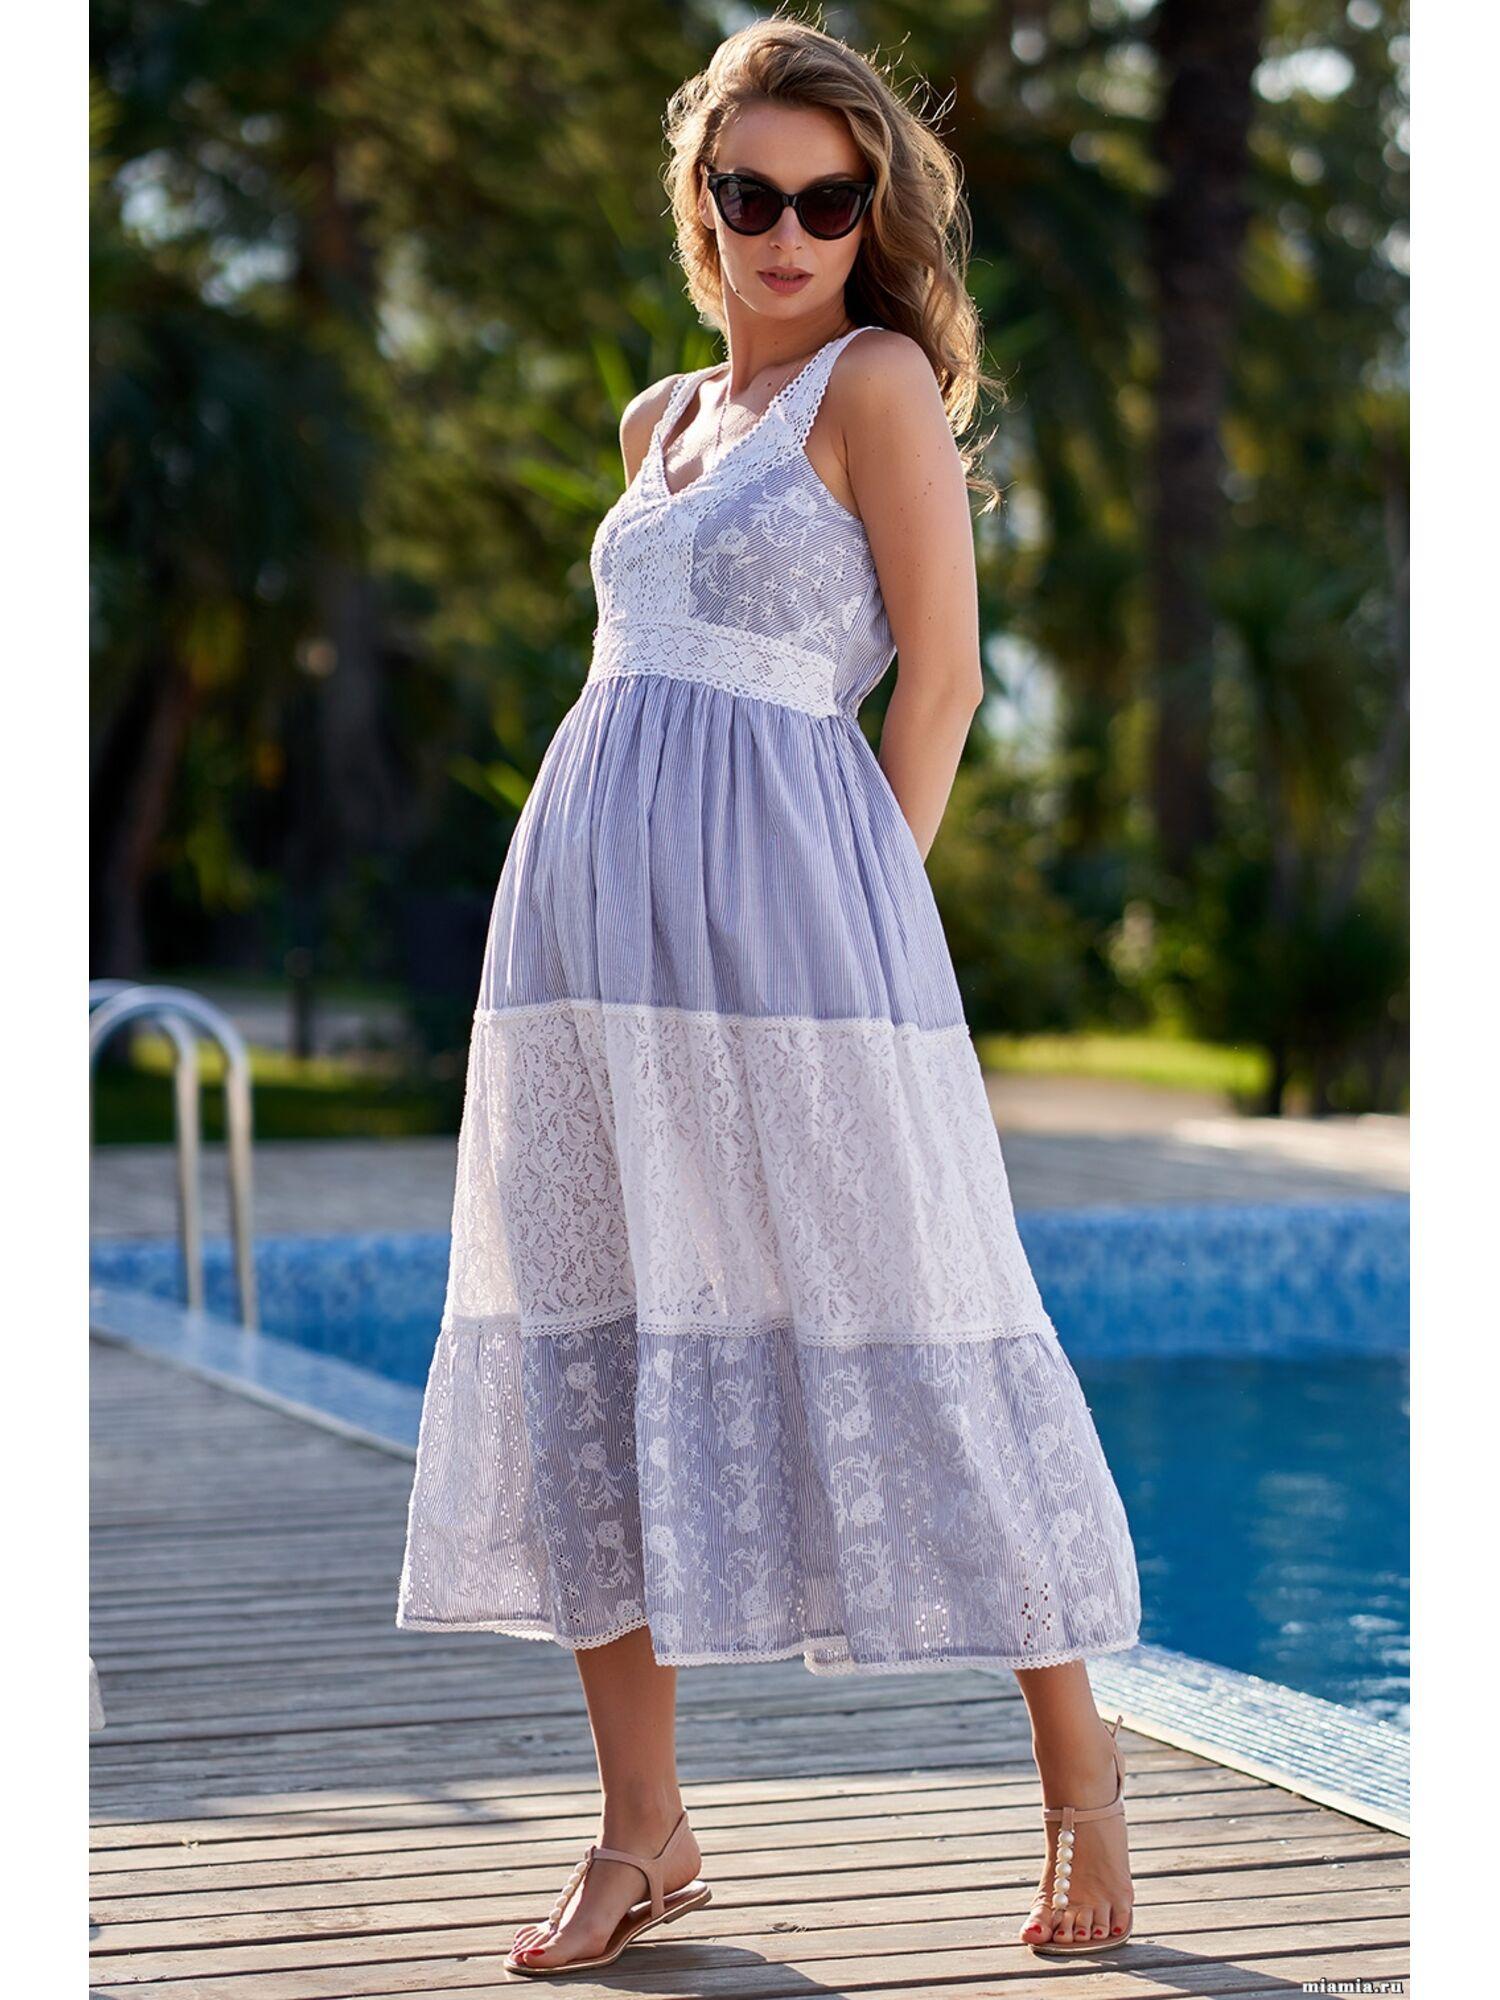 Сарафан, туника пляжная хлопковая Доминикана 1409, голубой, Mia-Amore